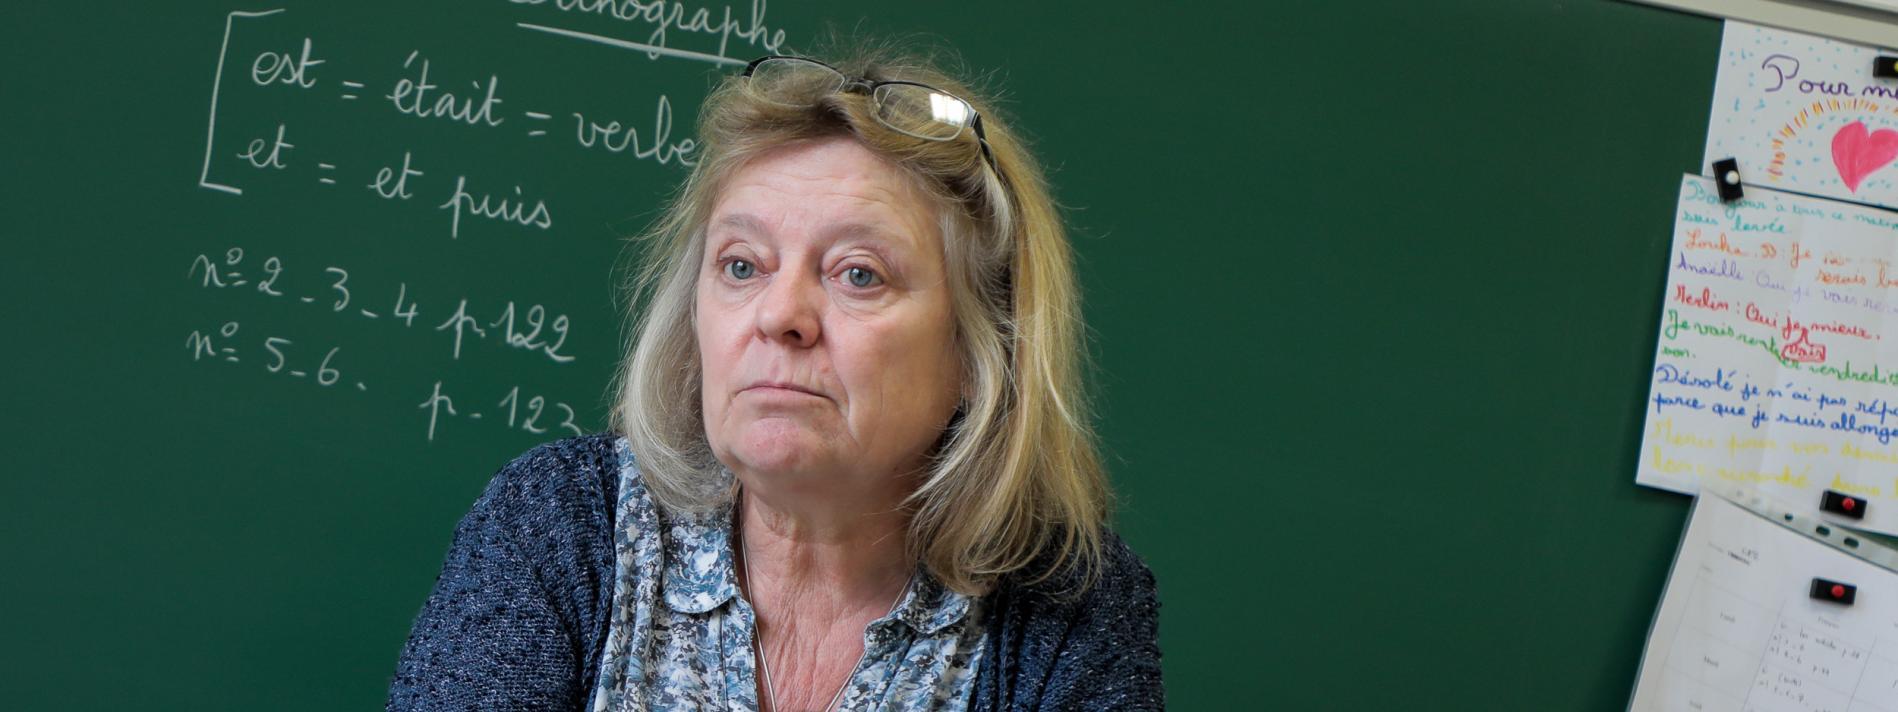 Rencontre La FormatA Qui Grand Se De Enseignante VirginieUne w0N8XnOPk